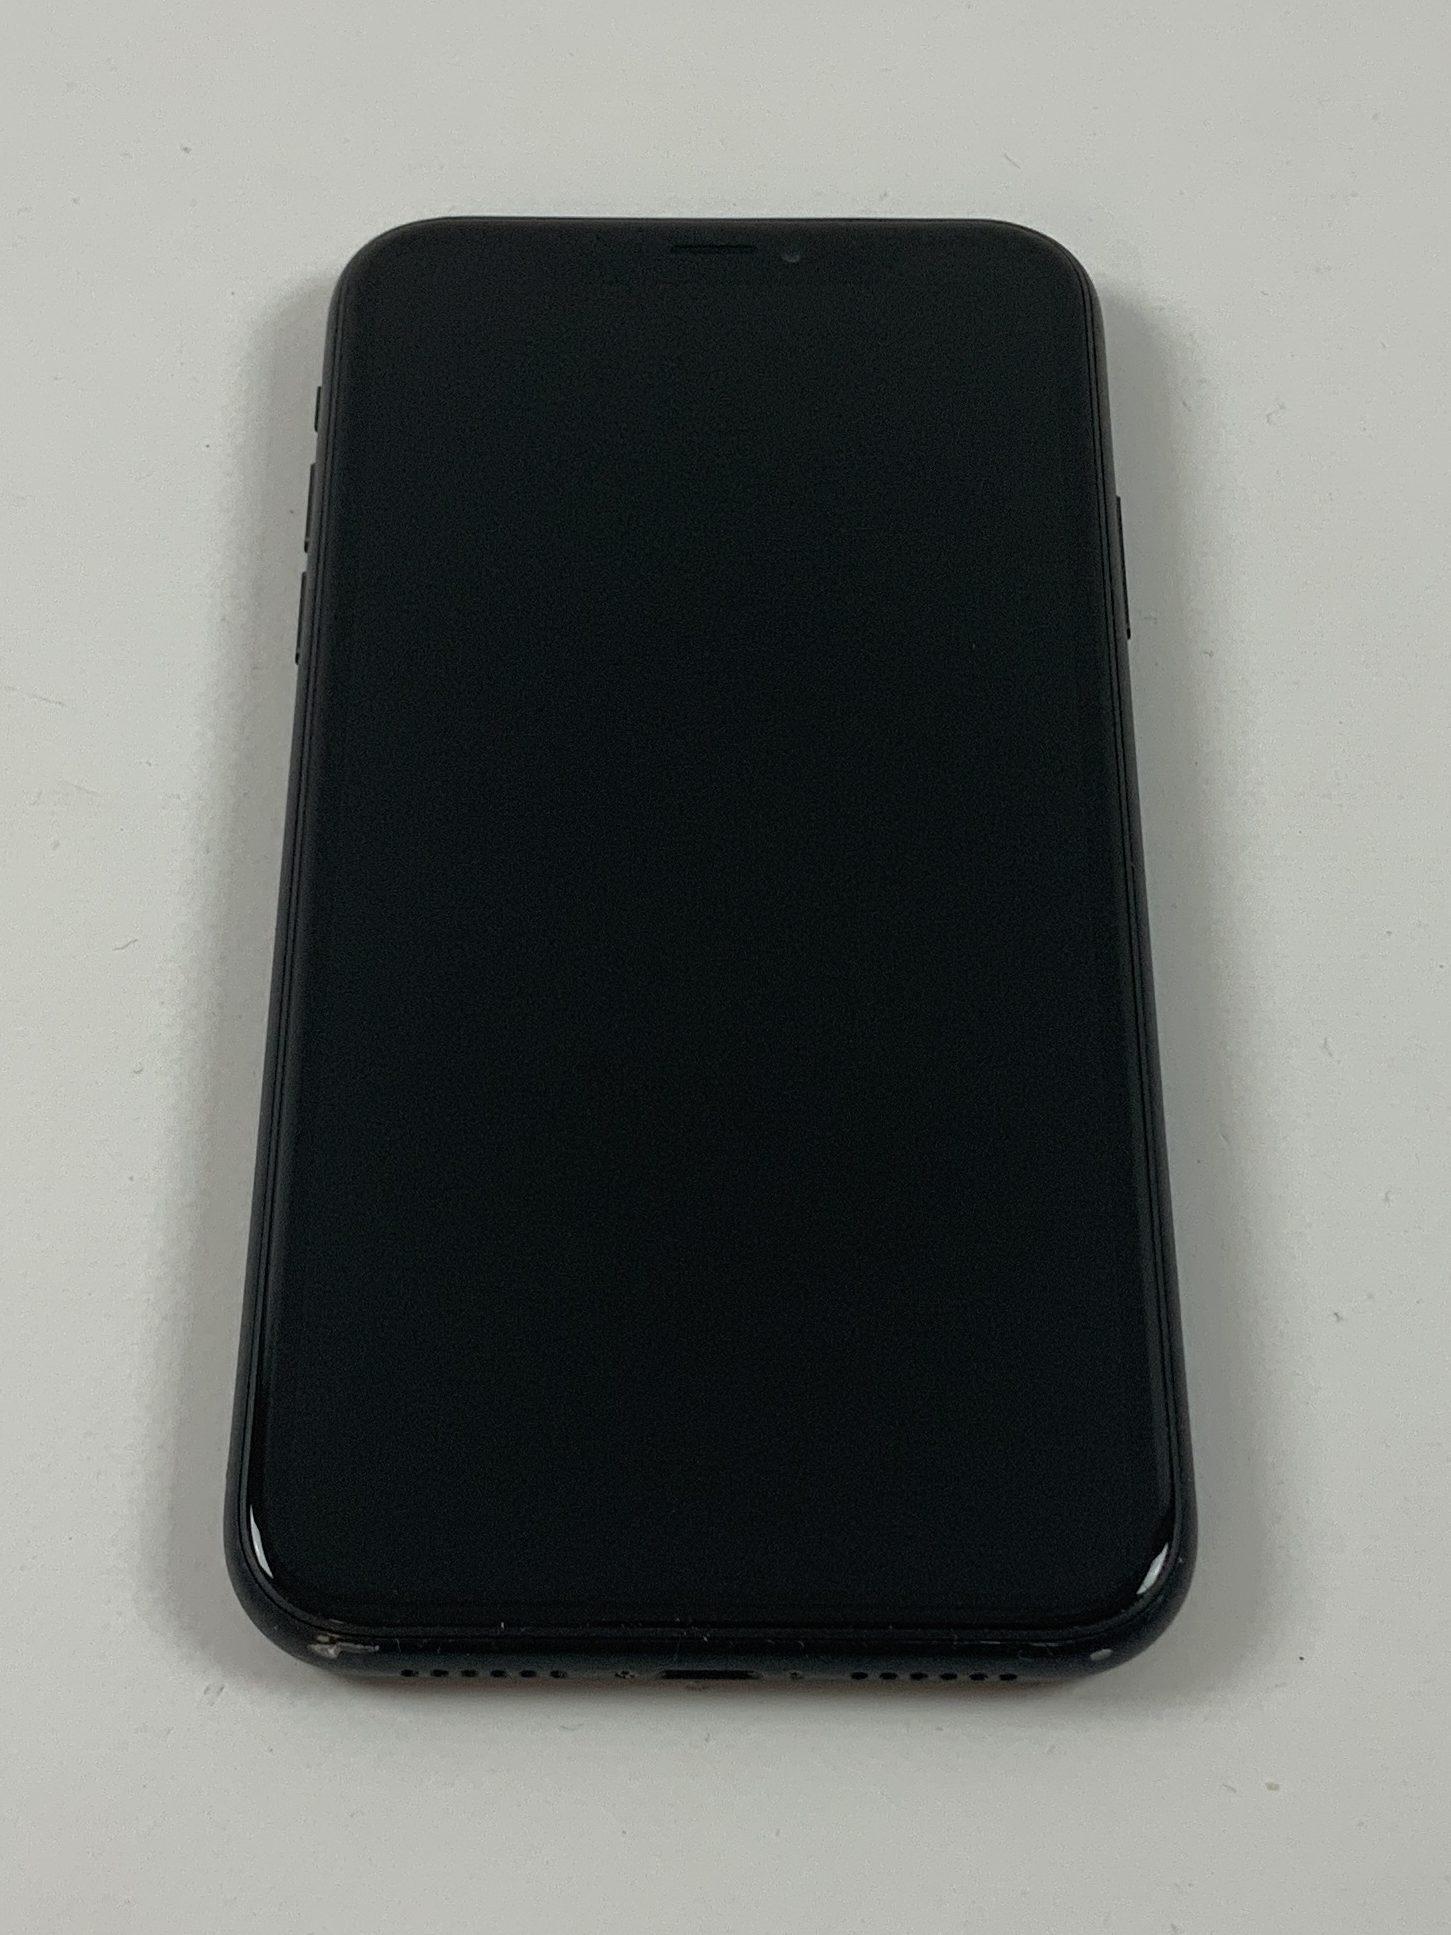 iPhone XR 256GB, 256GB, Black, image 1